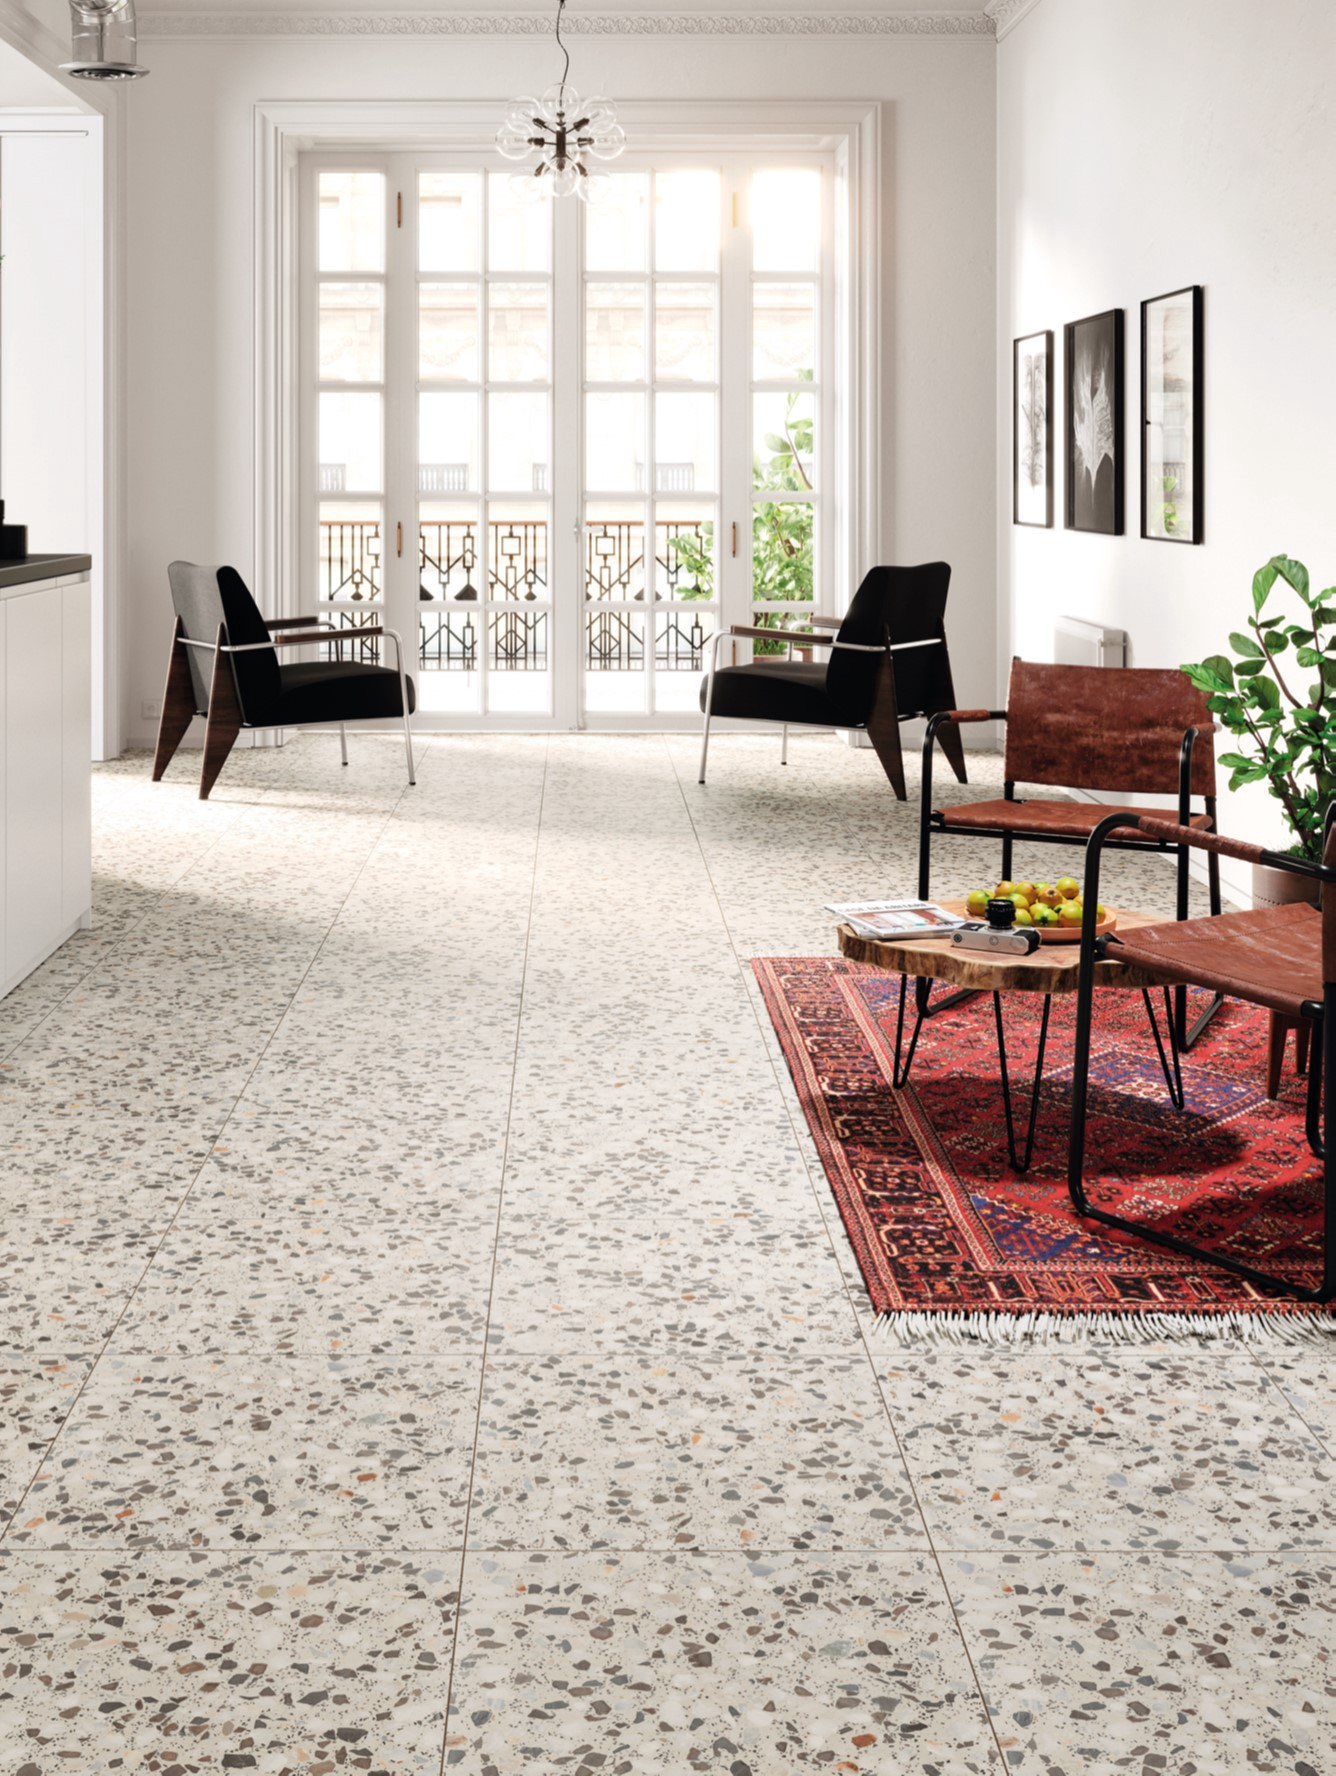 terrazzo flooring in a living room